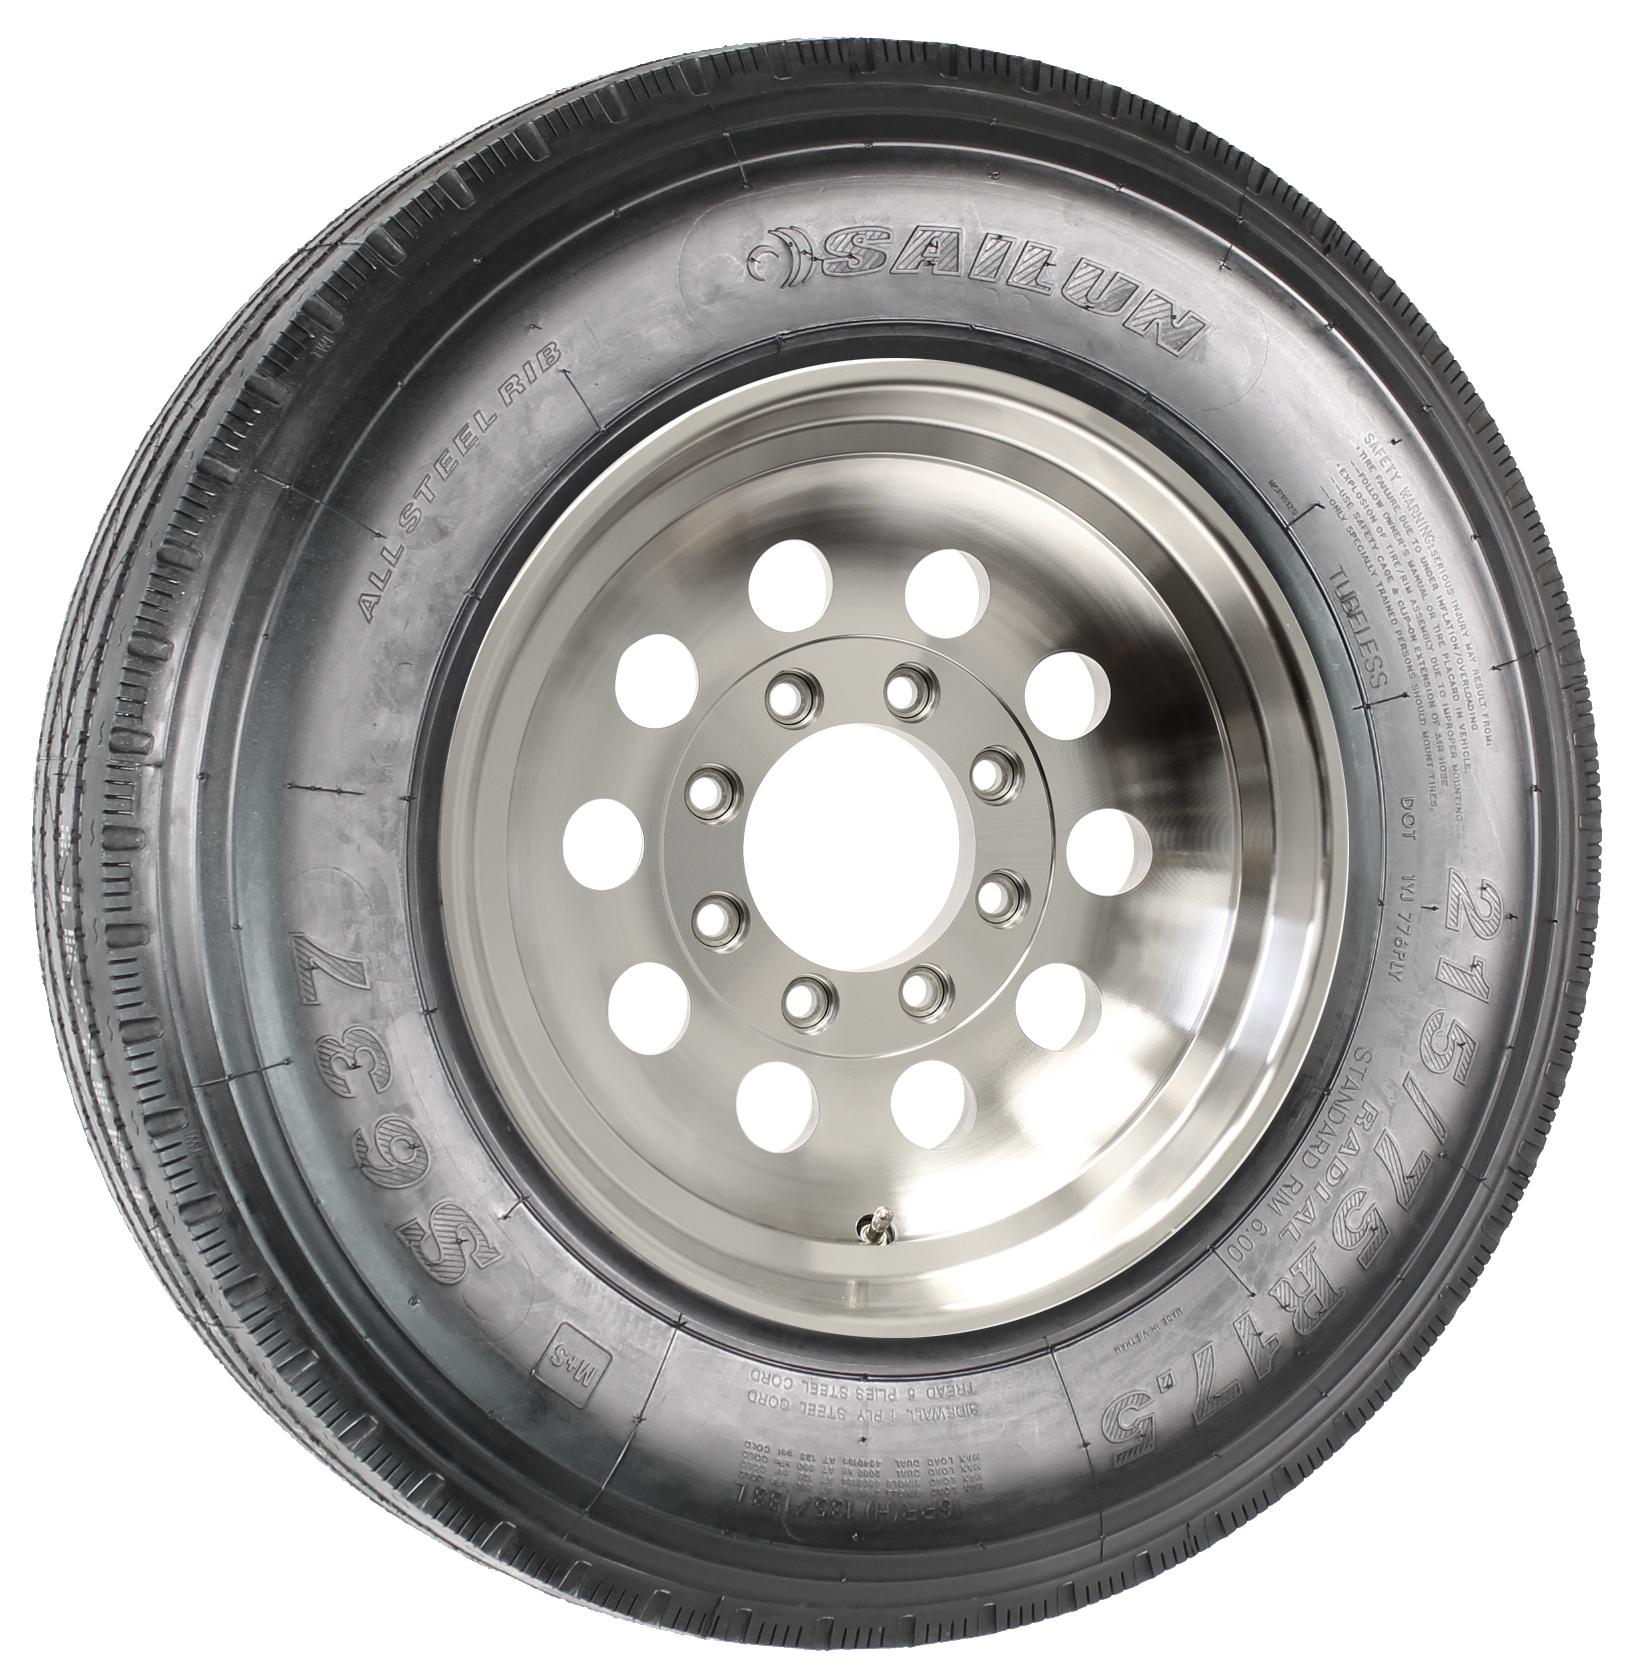 "Sailun 215/75R17.5 LRH Radial Tire on 17.5"" 8-Lug Aluminum Mod Assembly Image"